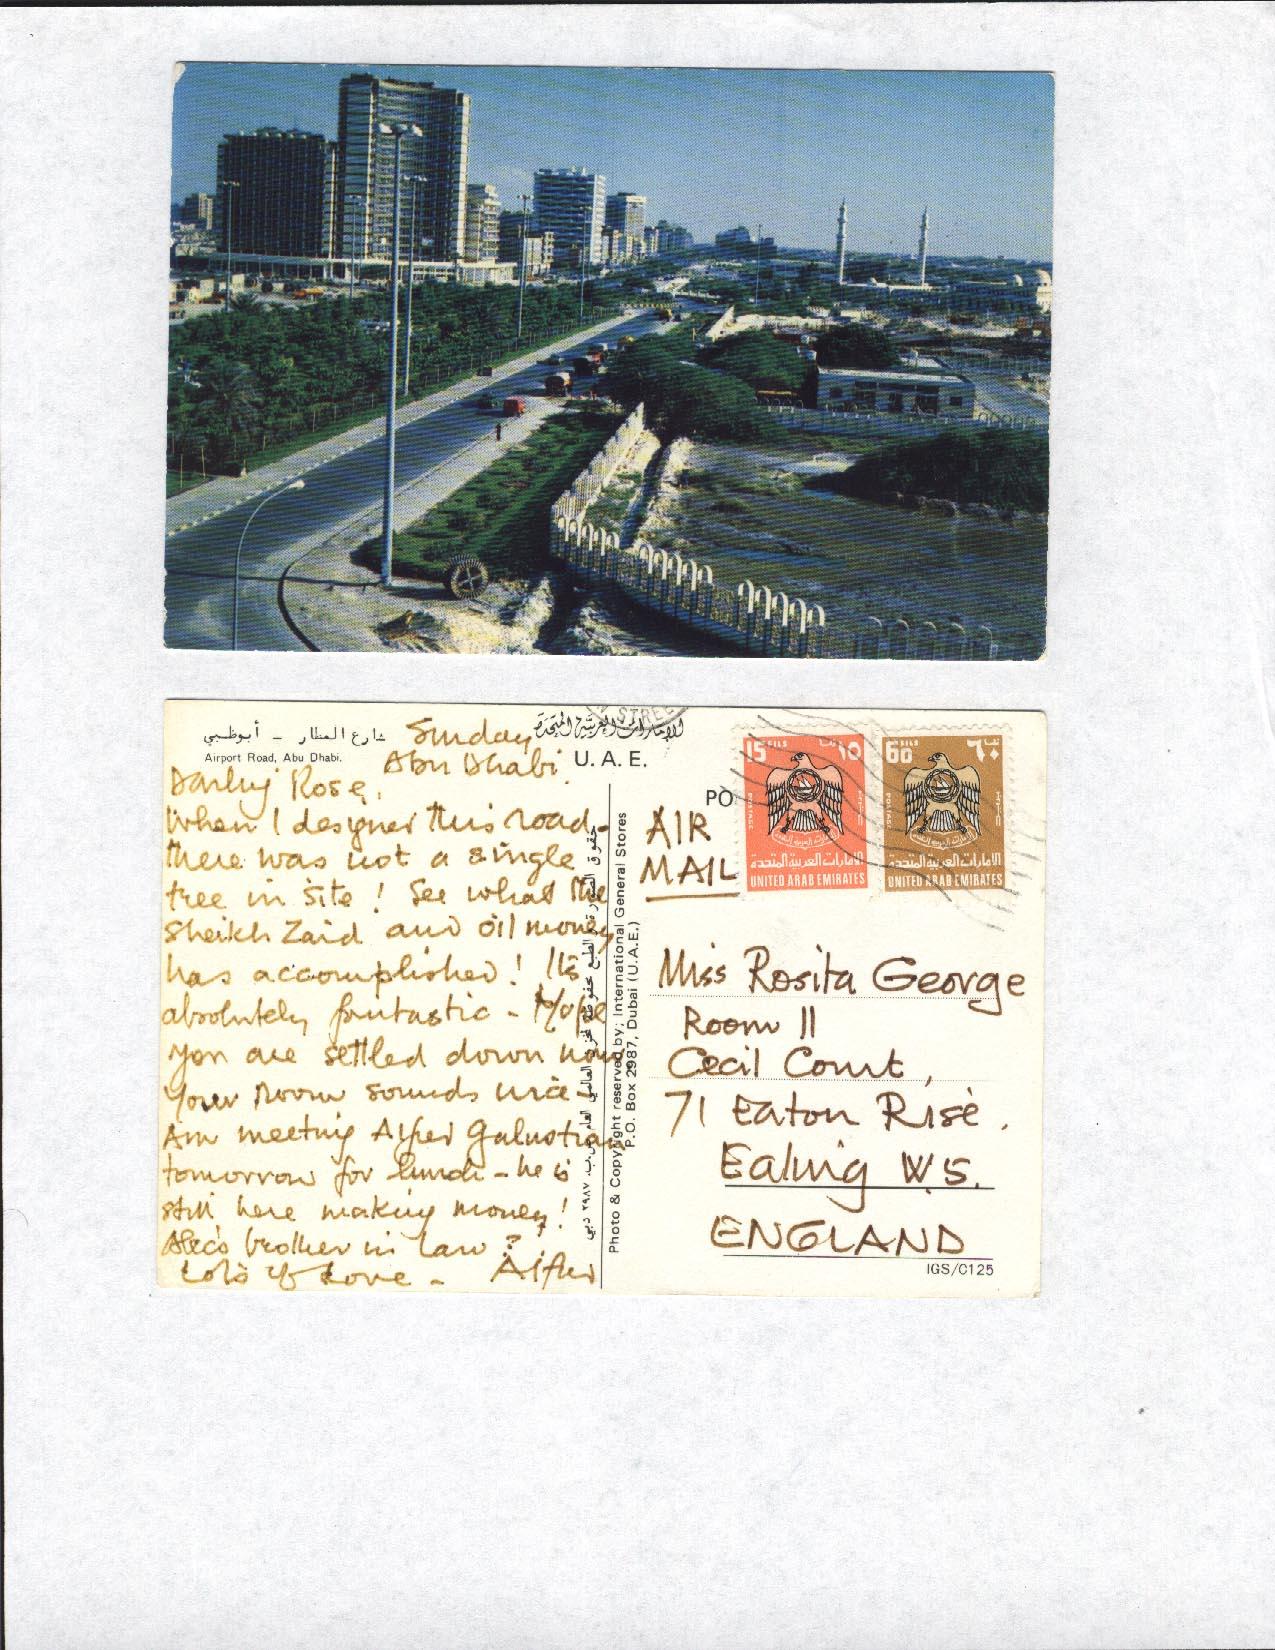 #AbuDhabi #OriginalTownPlanner #RIBA #Architect #AlfredGeorge #ArabiconAssociatedConsultants #PendingFeesToMeet #ilookup